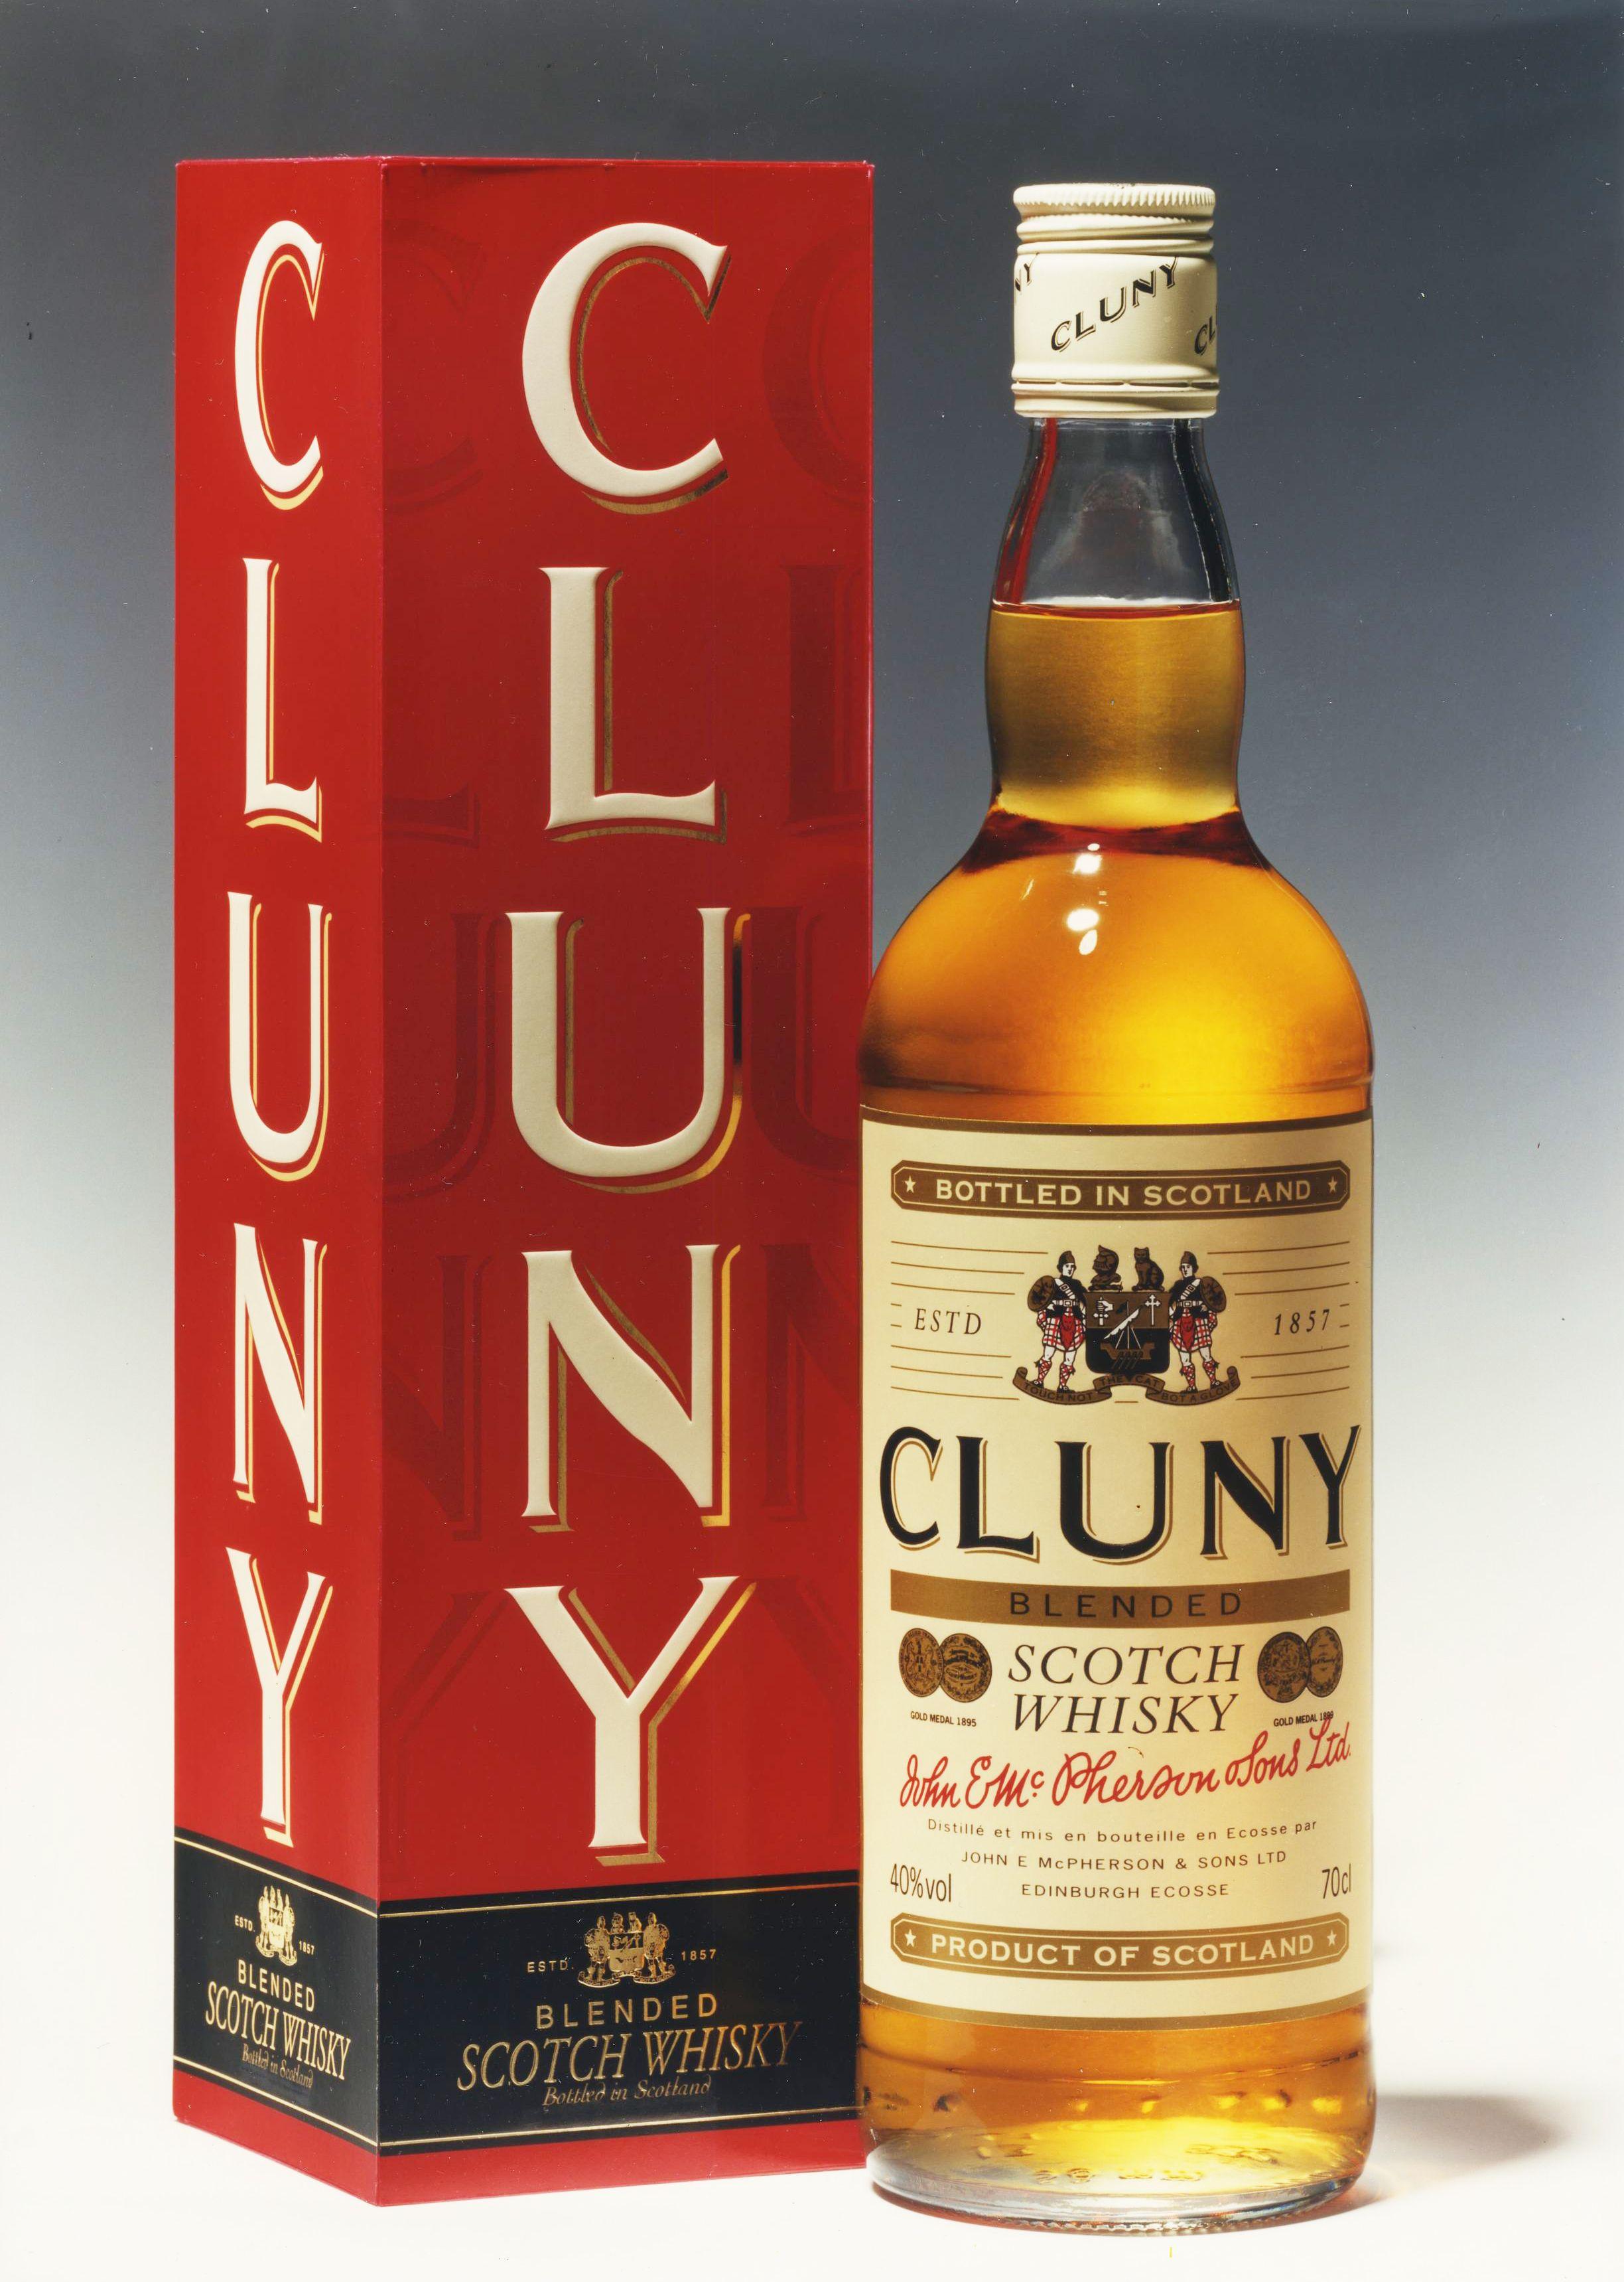 Cluny Scotch Whisky Memento Linea Ambalaj Tasar M Pinterest # Muebles Para Guardar Whisky